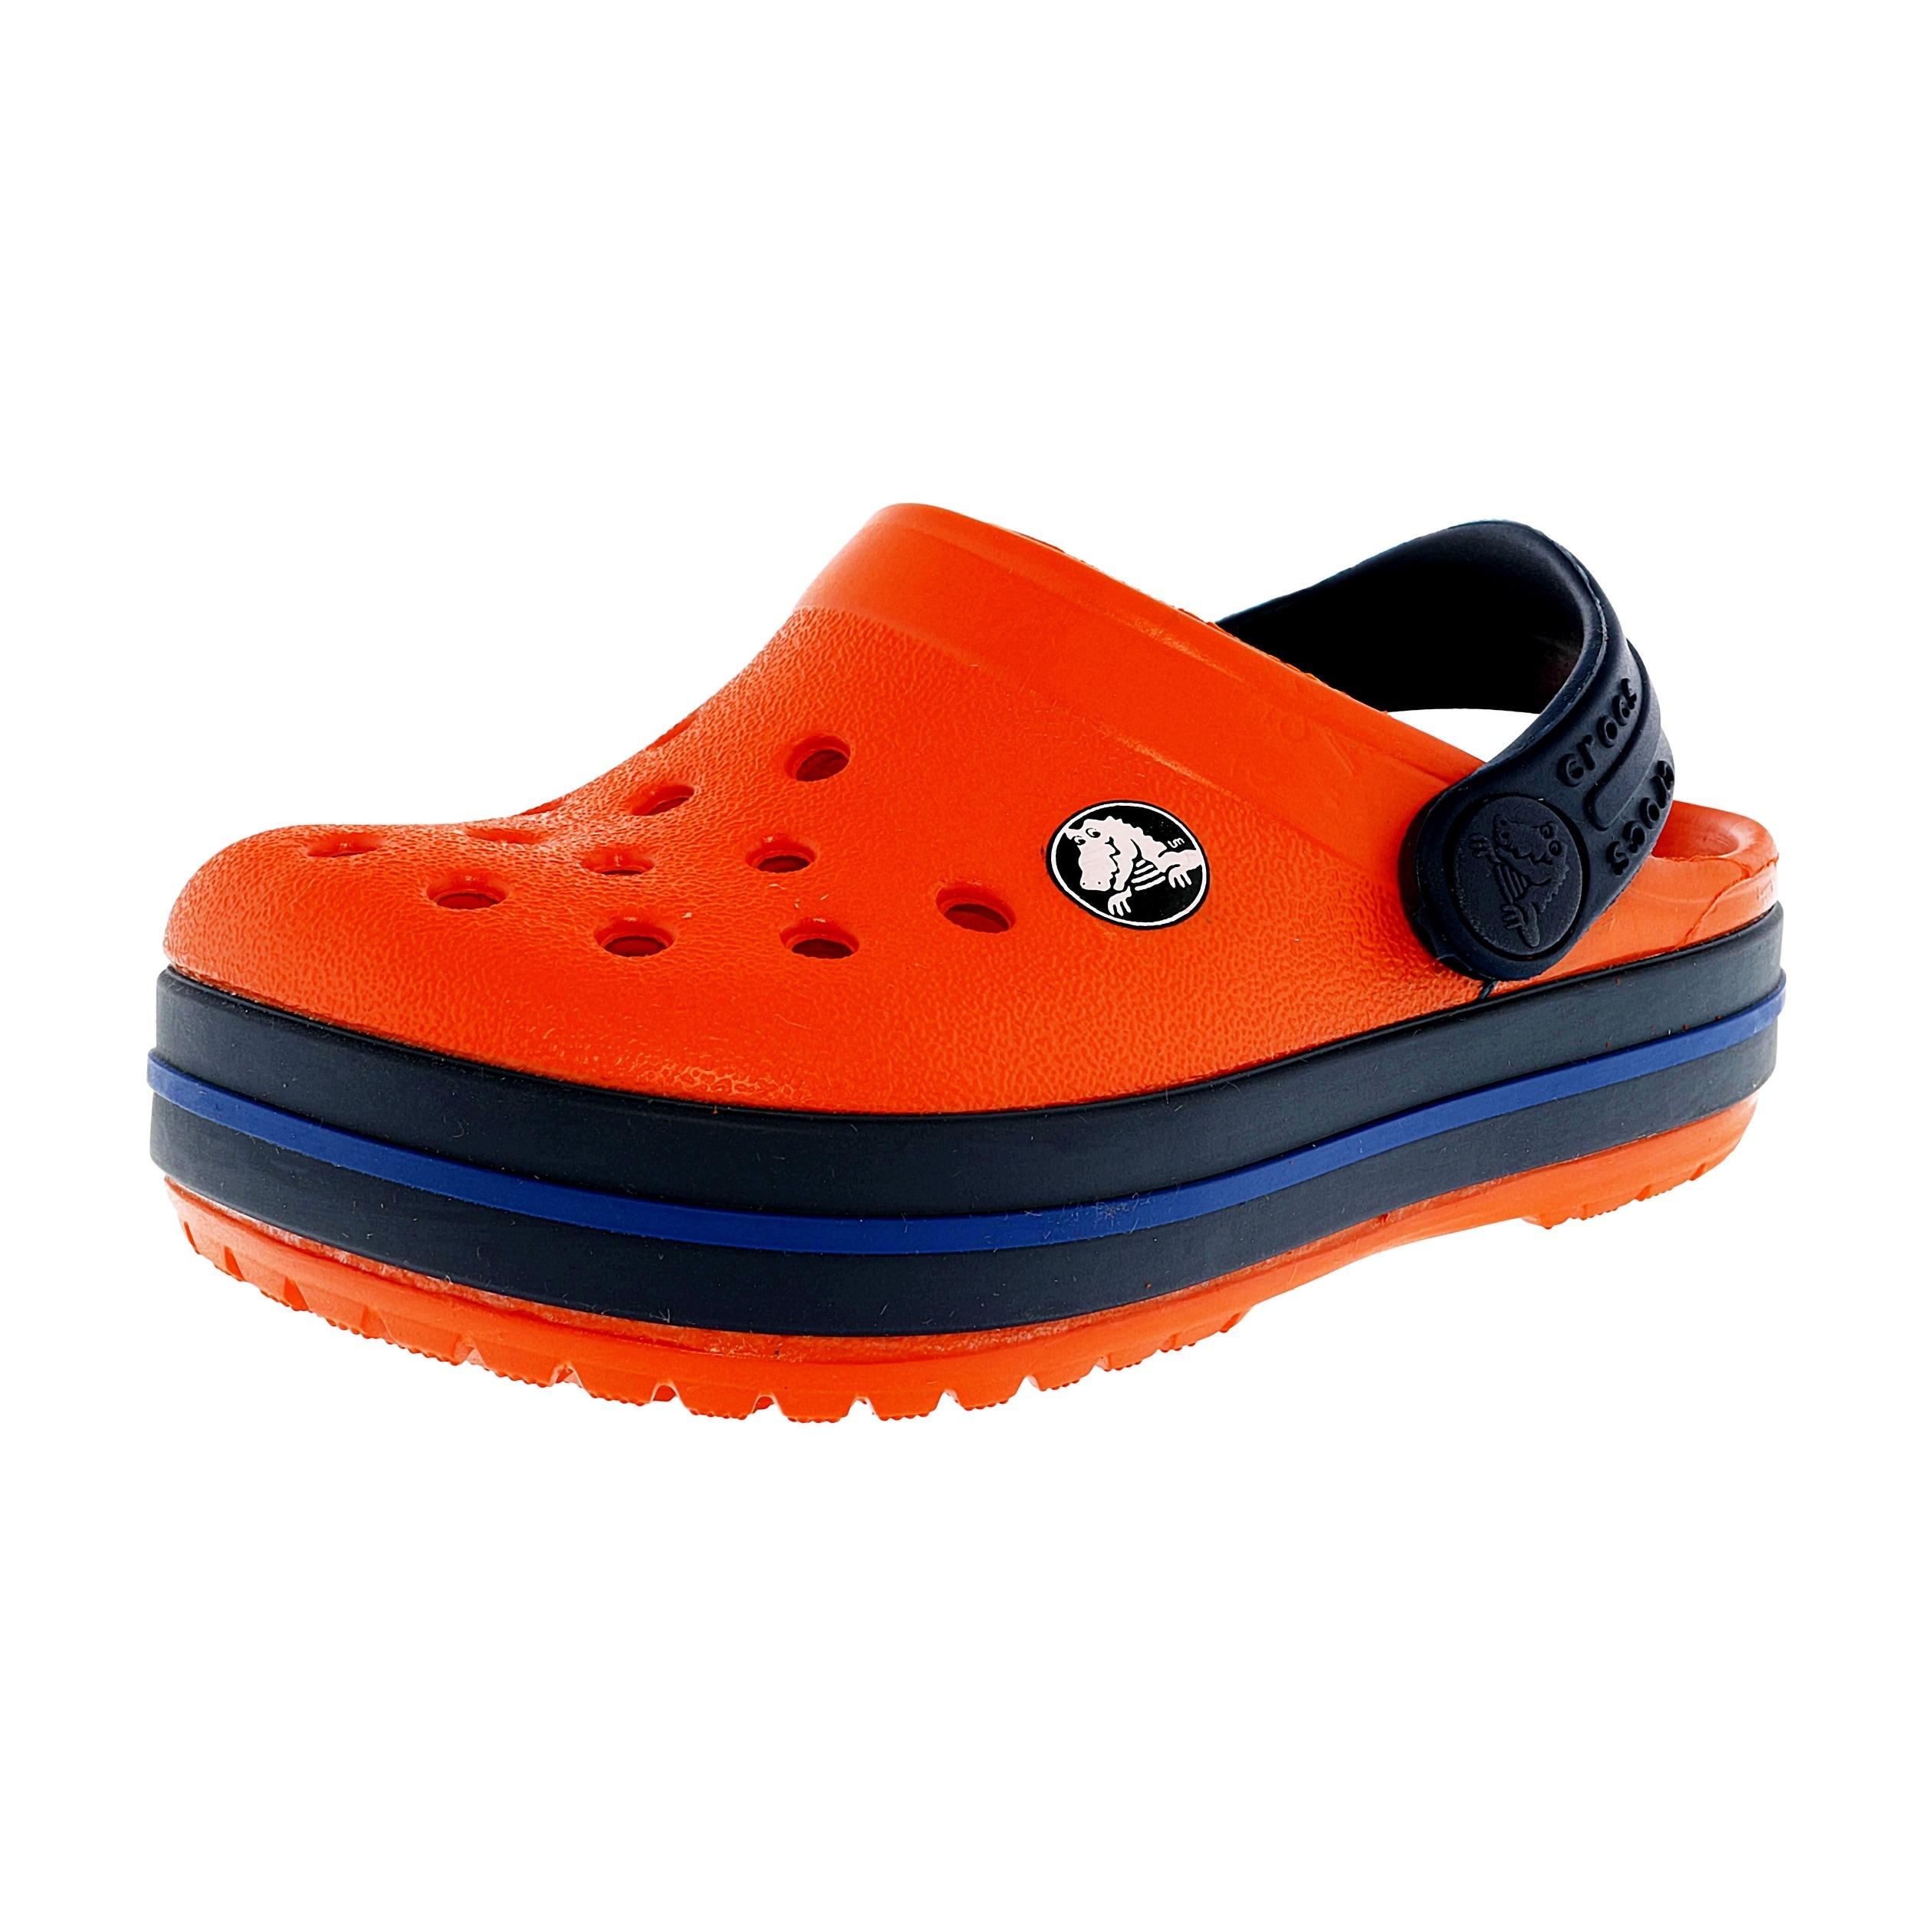 Crocs Unisex Kids Crocband Clog